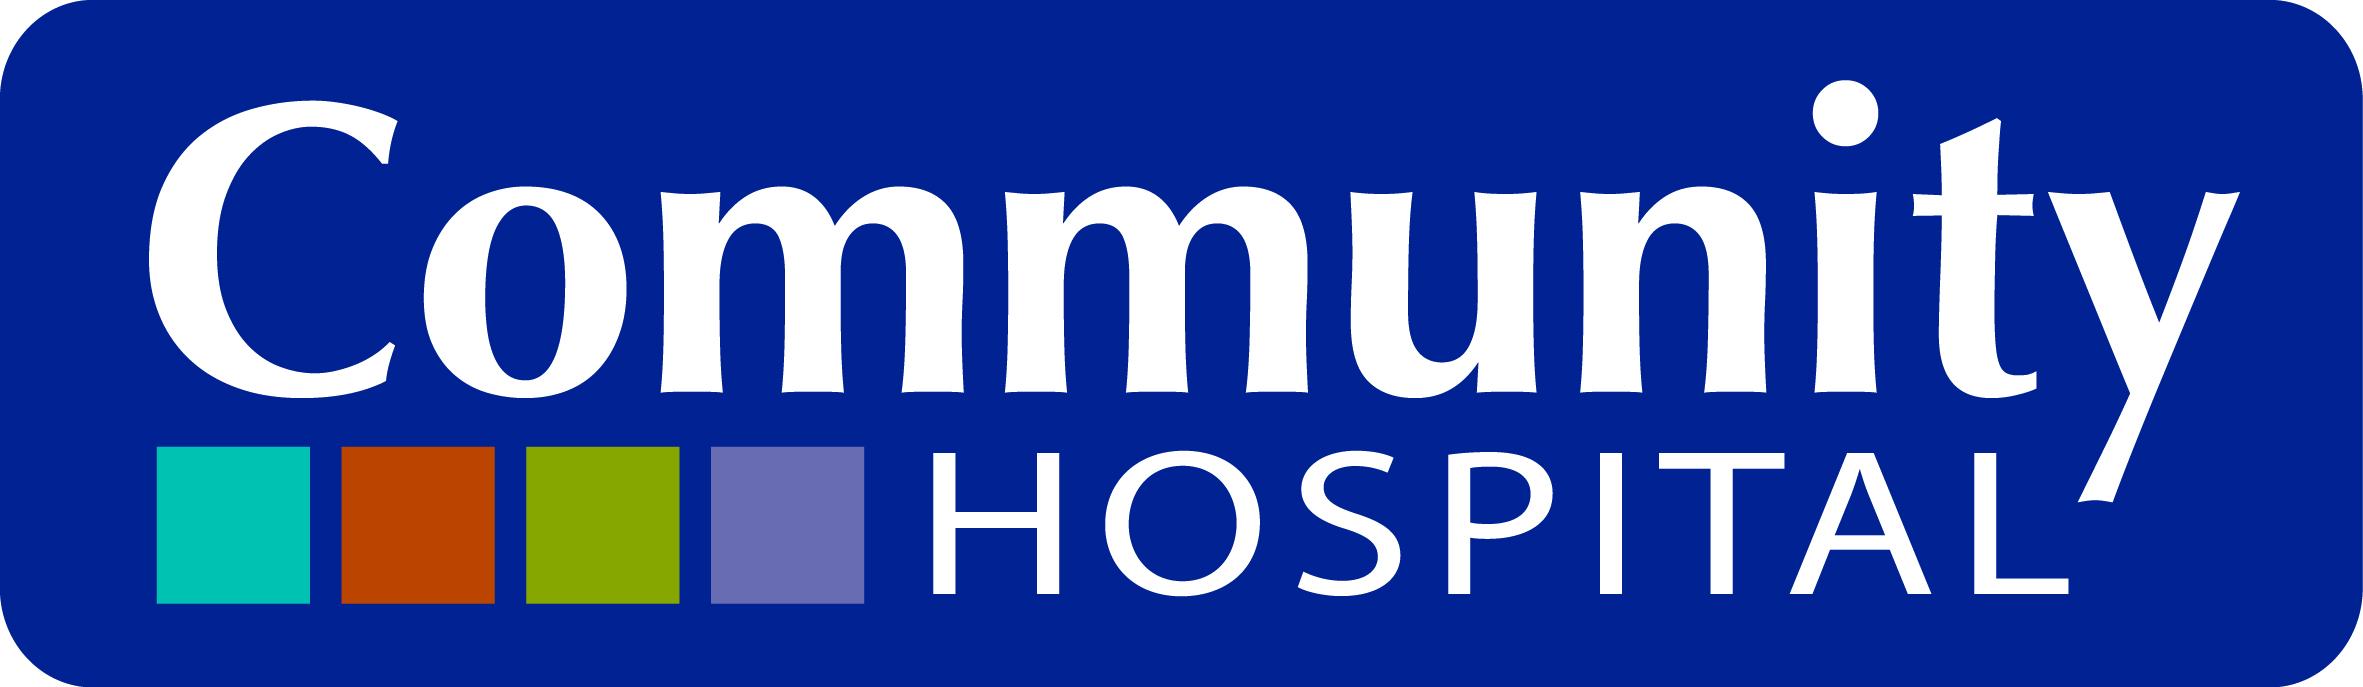 Community Hospital